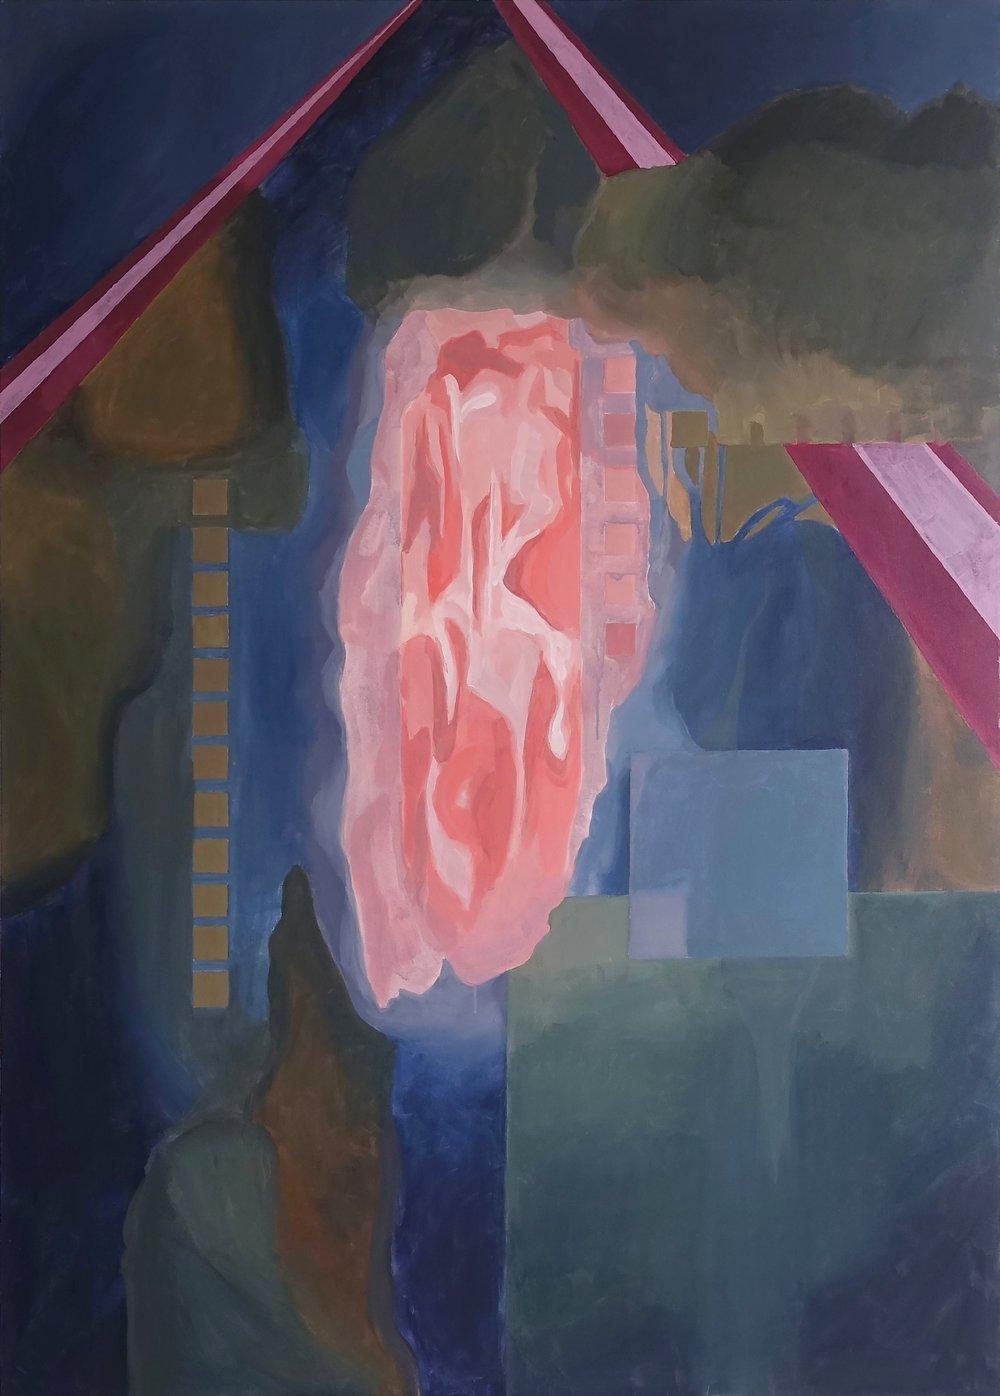 Untitled (Zygt zg), (2018)